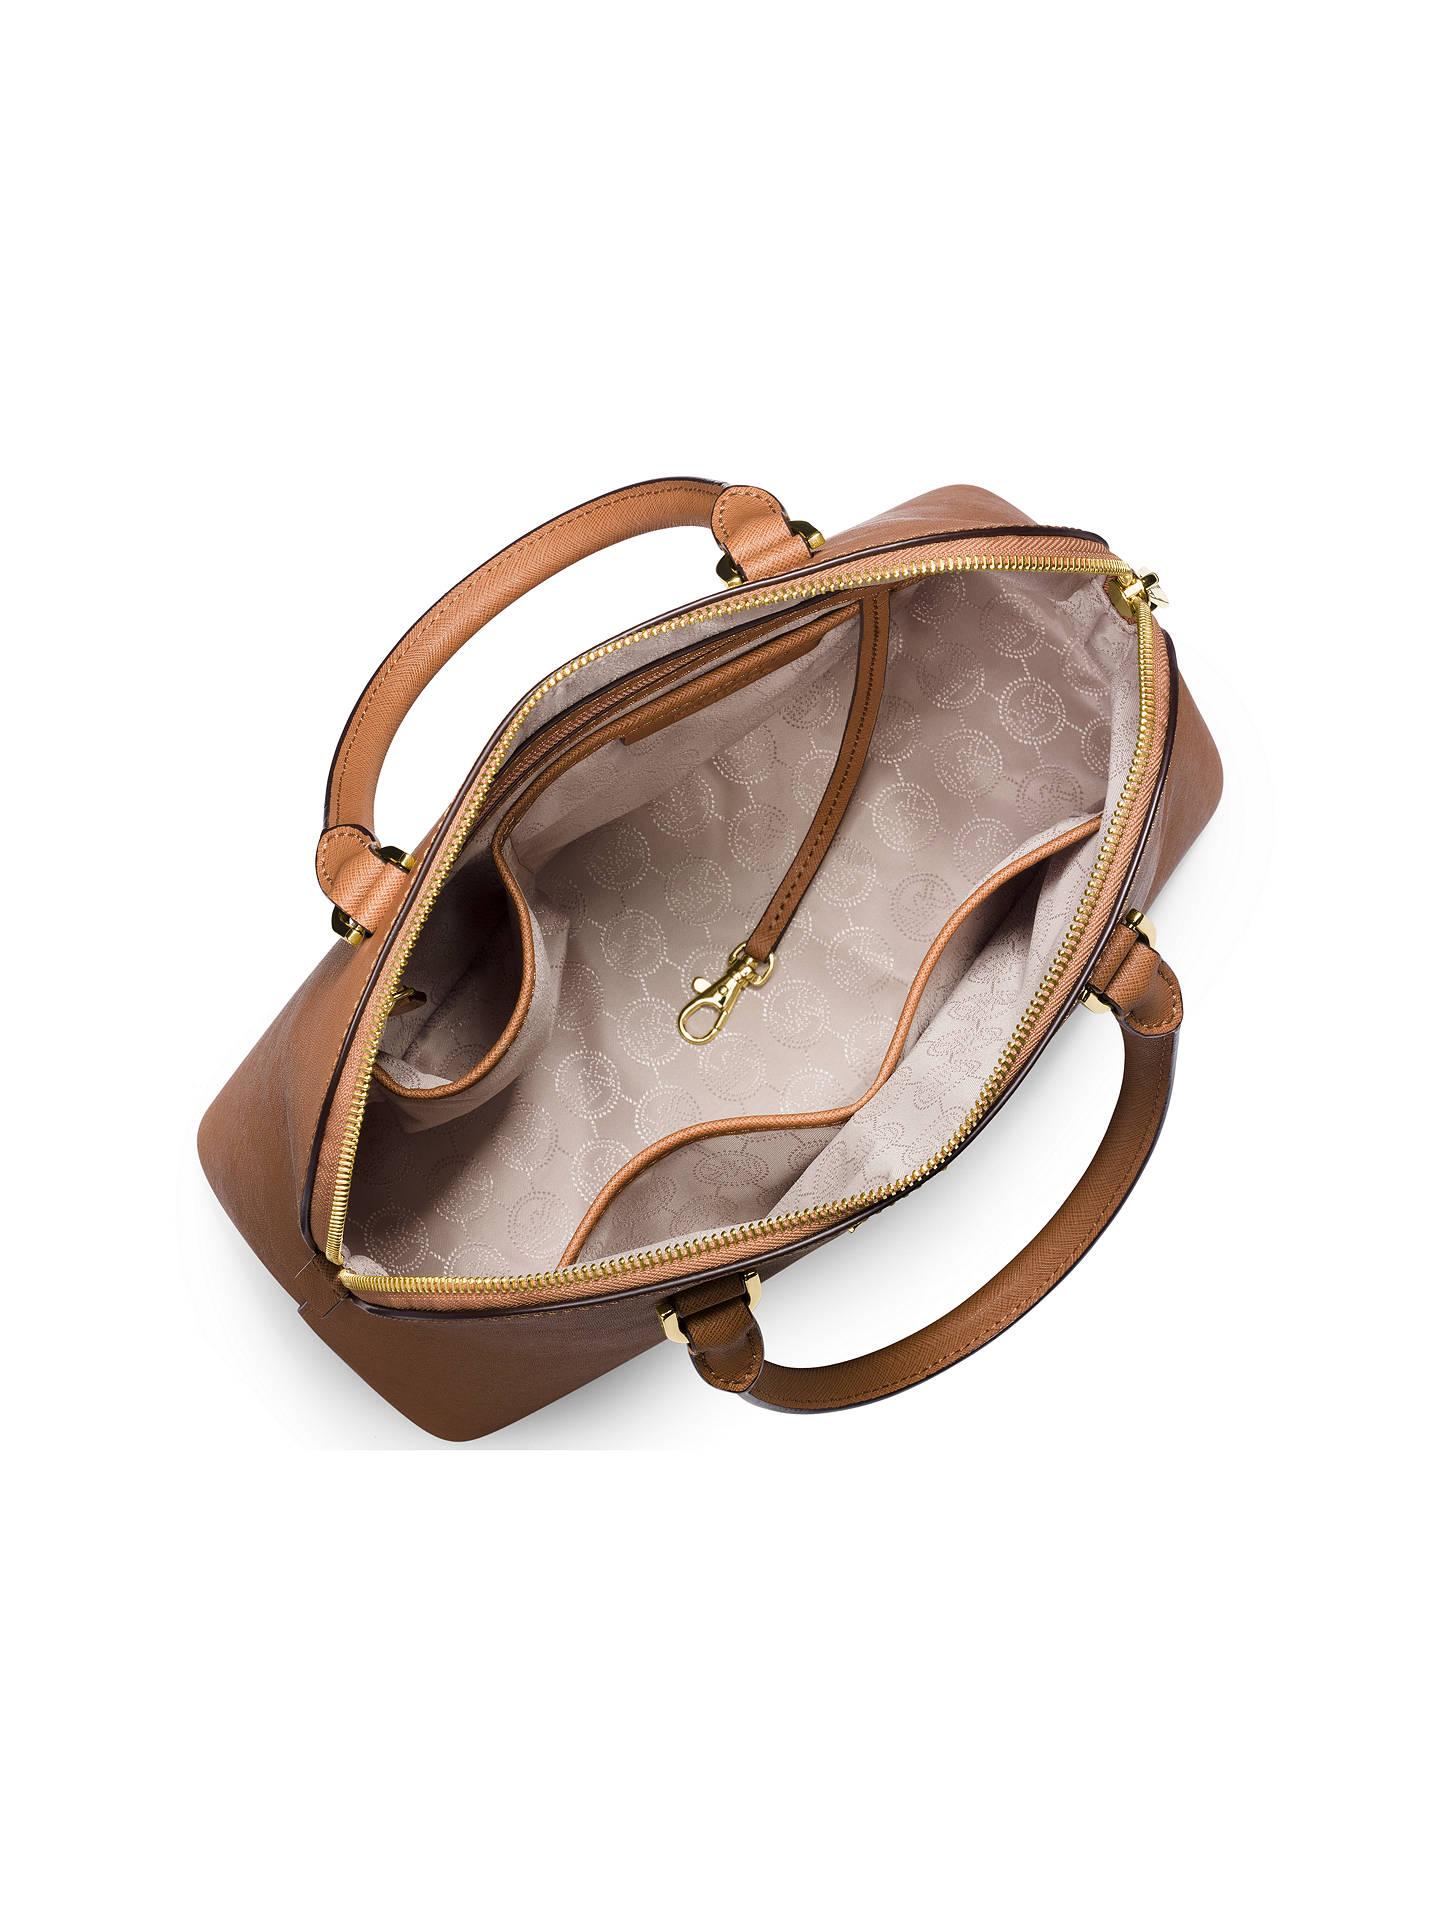 33bc8d9dbee1 ... Buy MICHAEL Michael Kors Cindy Large Leather Dome Satchel, Peanut  Online at johnlewis.com